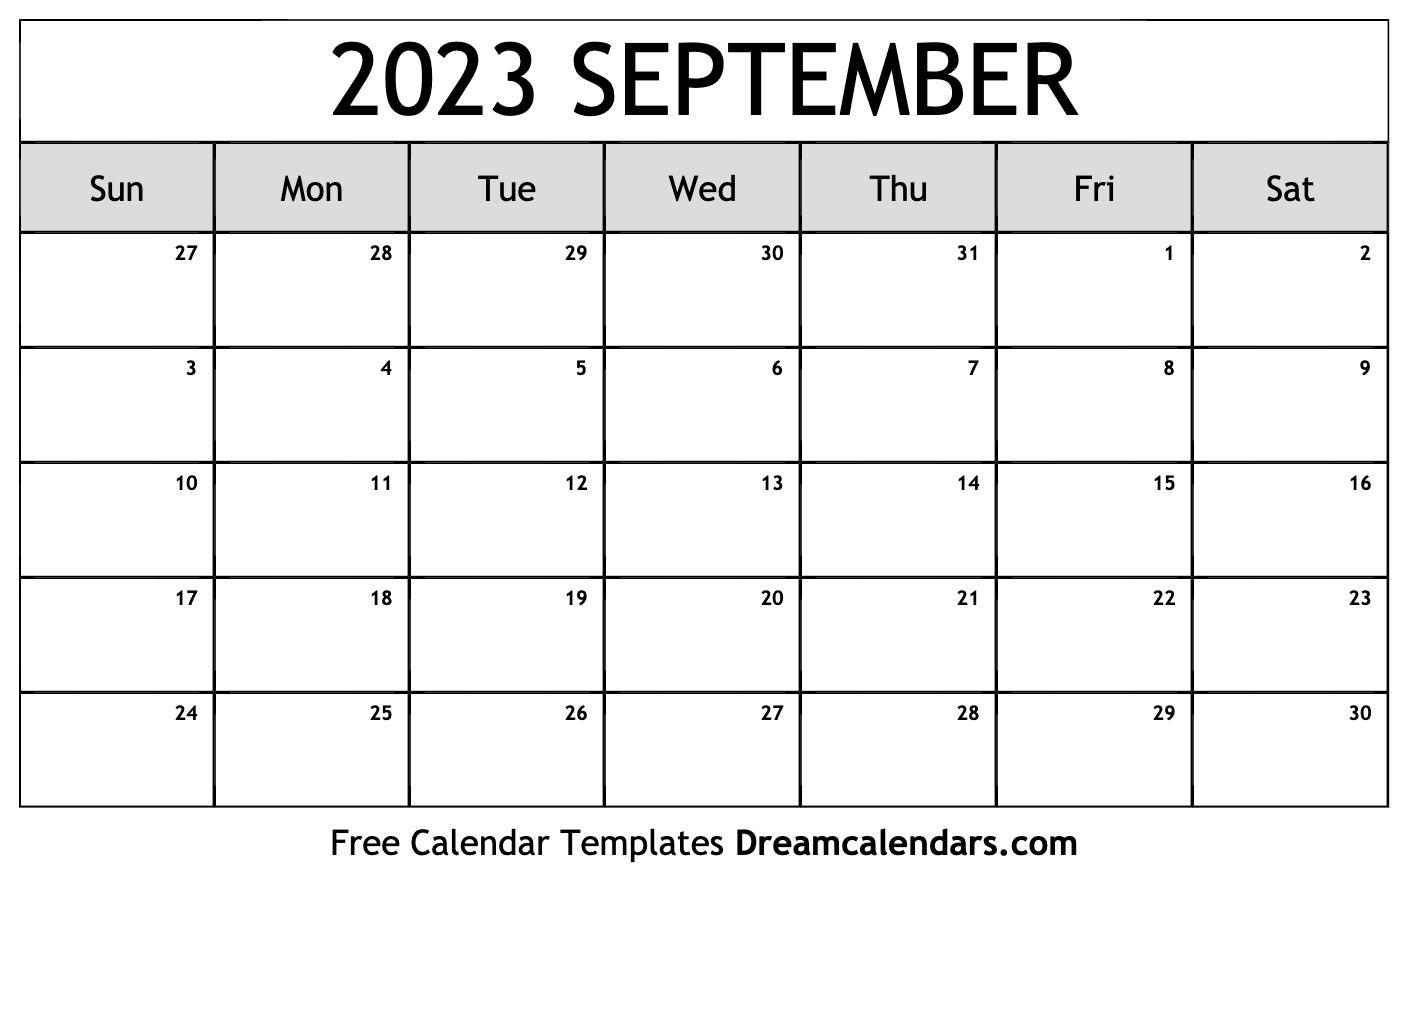 September 2023 Calendar | Free Blank Printable Templates pertaining to Sunset And Sunrise Calender 2022 2023